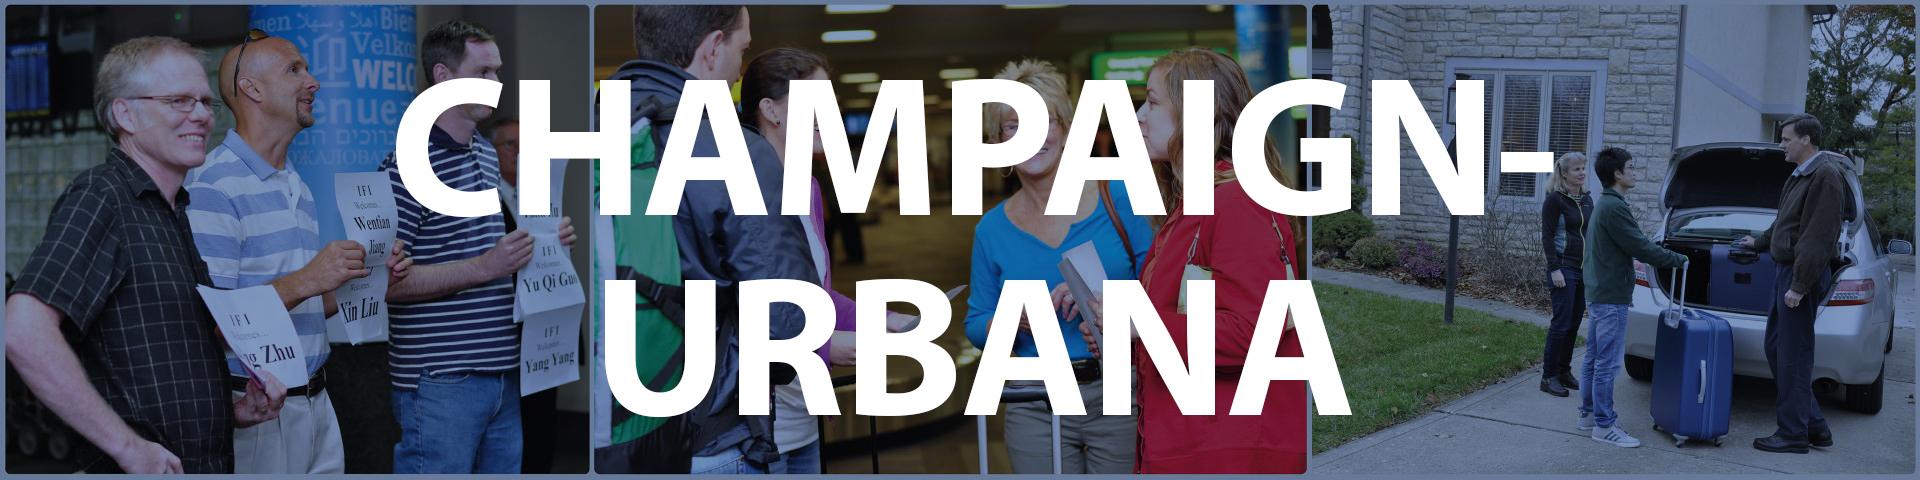 IFI Champaign-Urbana